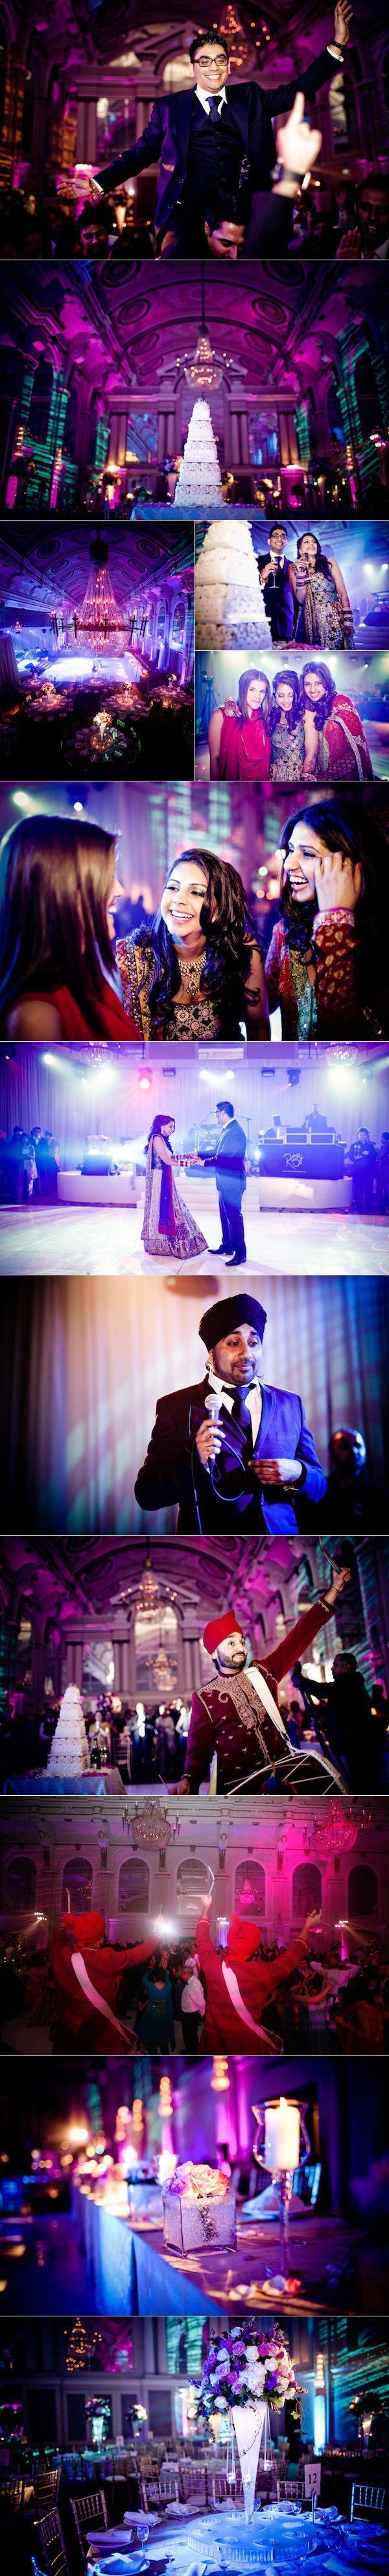 lavish indian wedding receptions | Real Wedding: Lavish Wedding Reception At London's Connaught Rooms